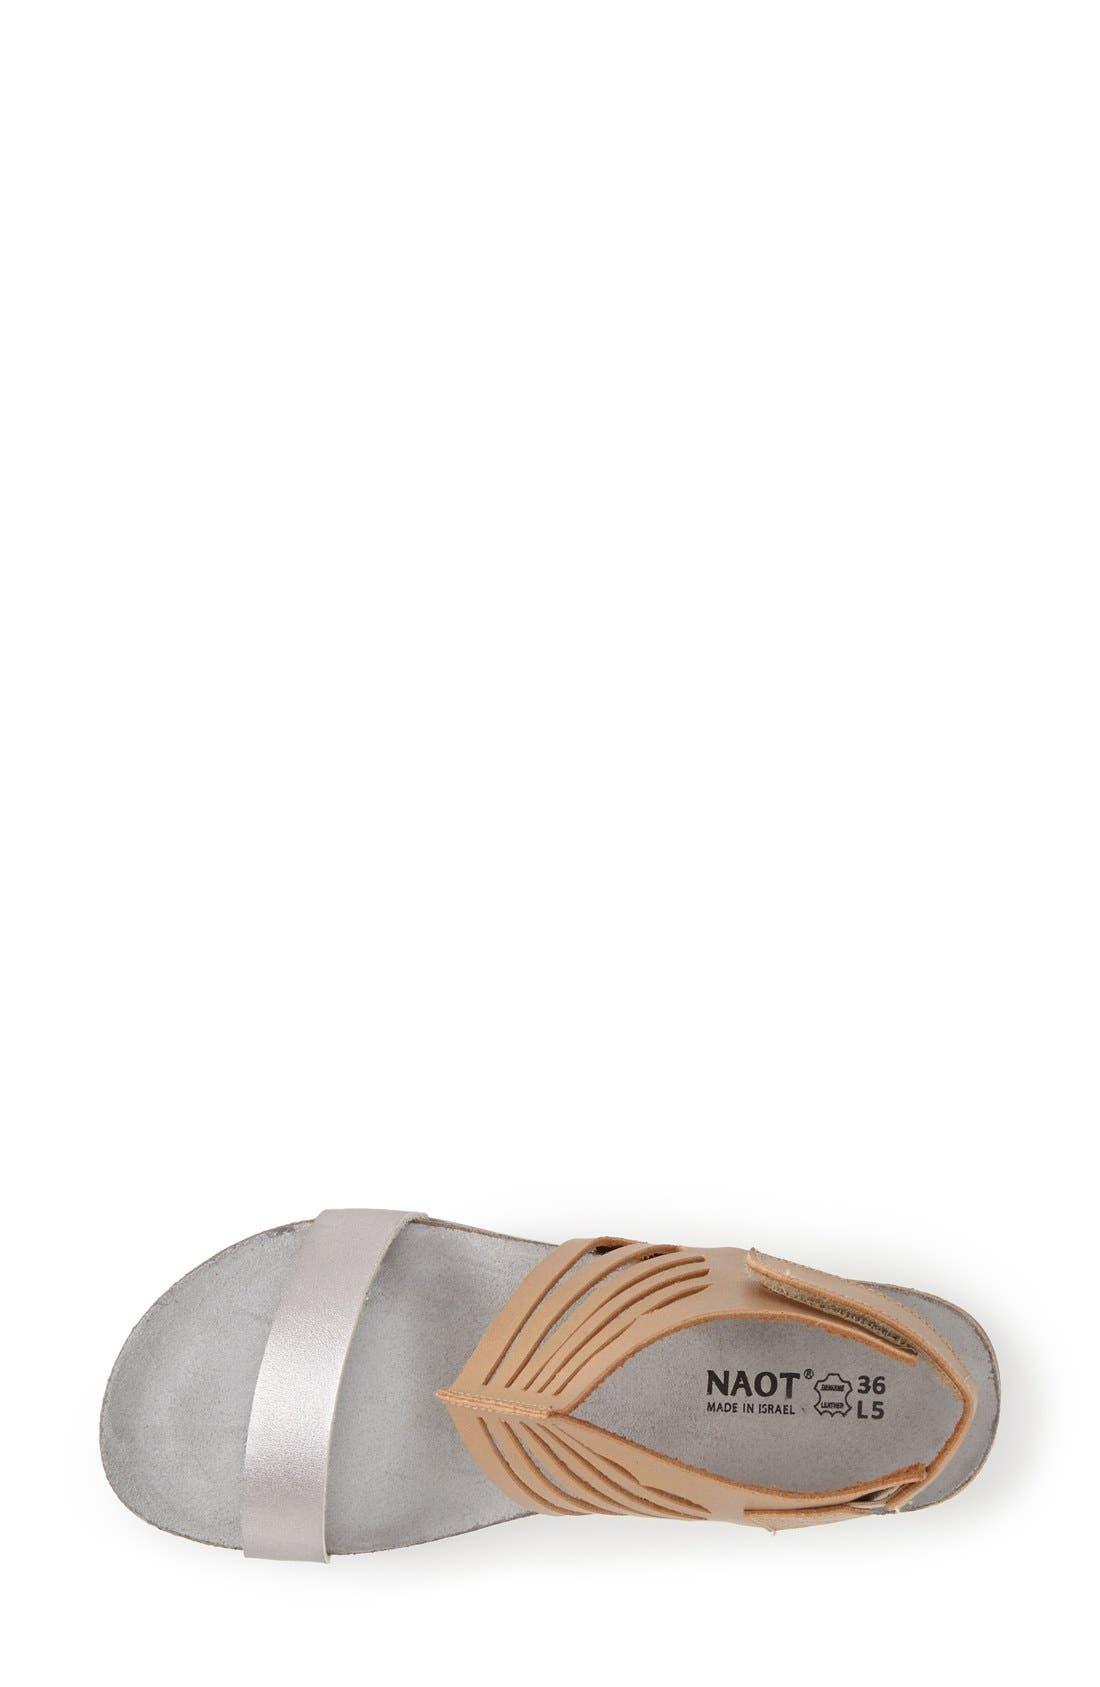 Alternate Image 3  - Naot 'Mint' Sandal (Women)